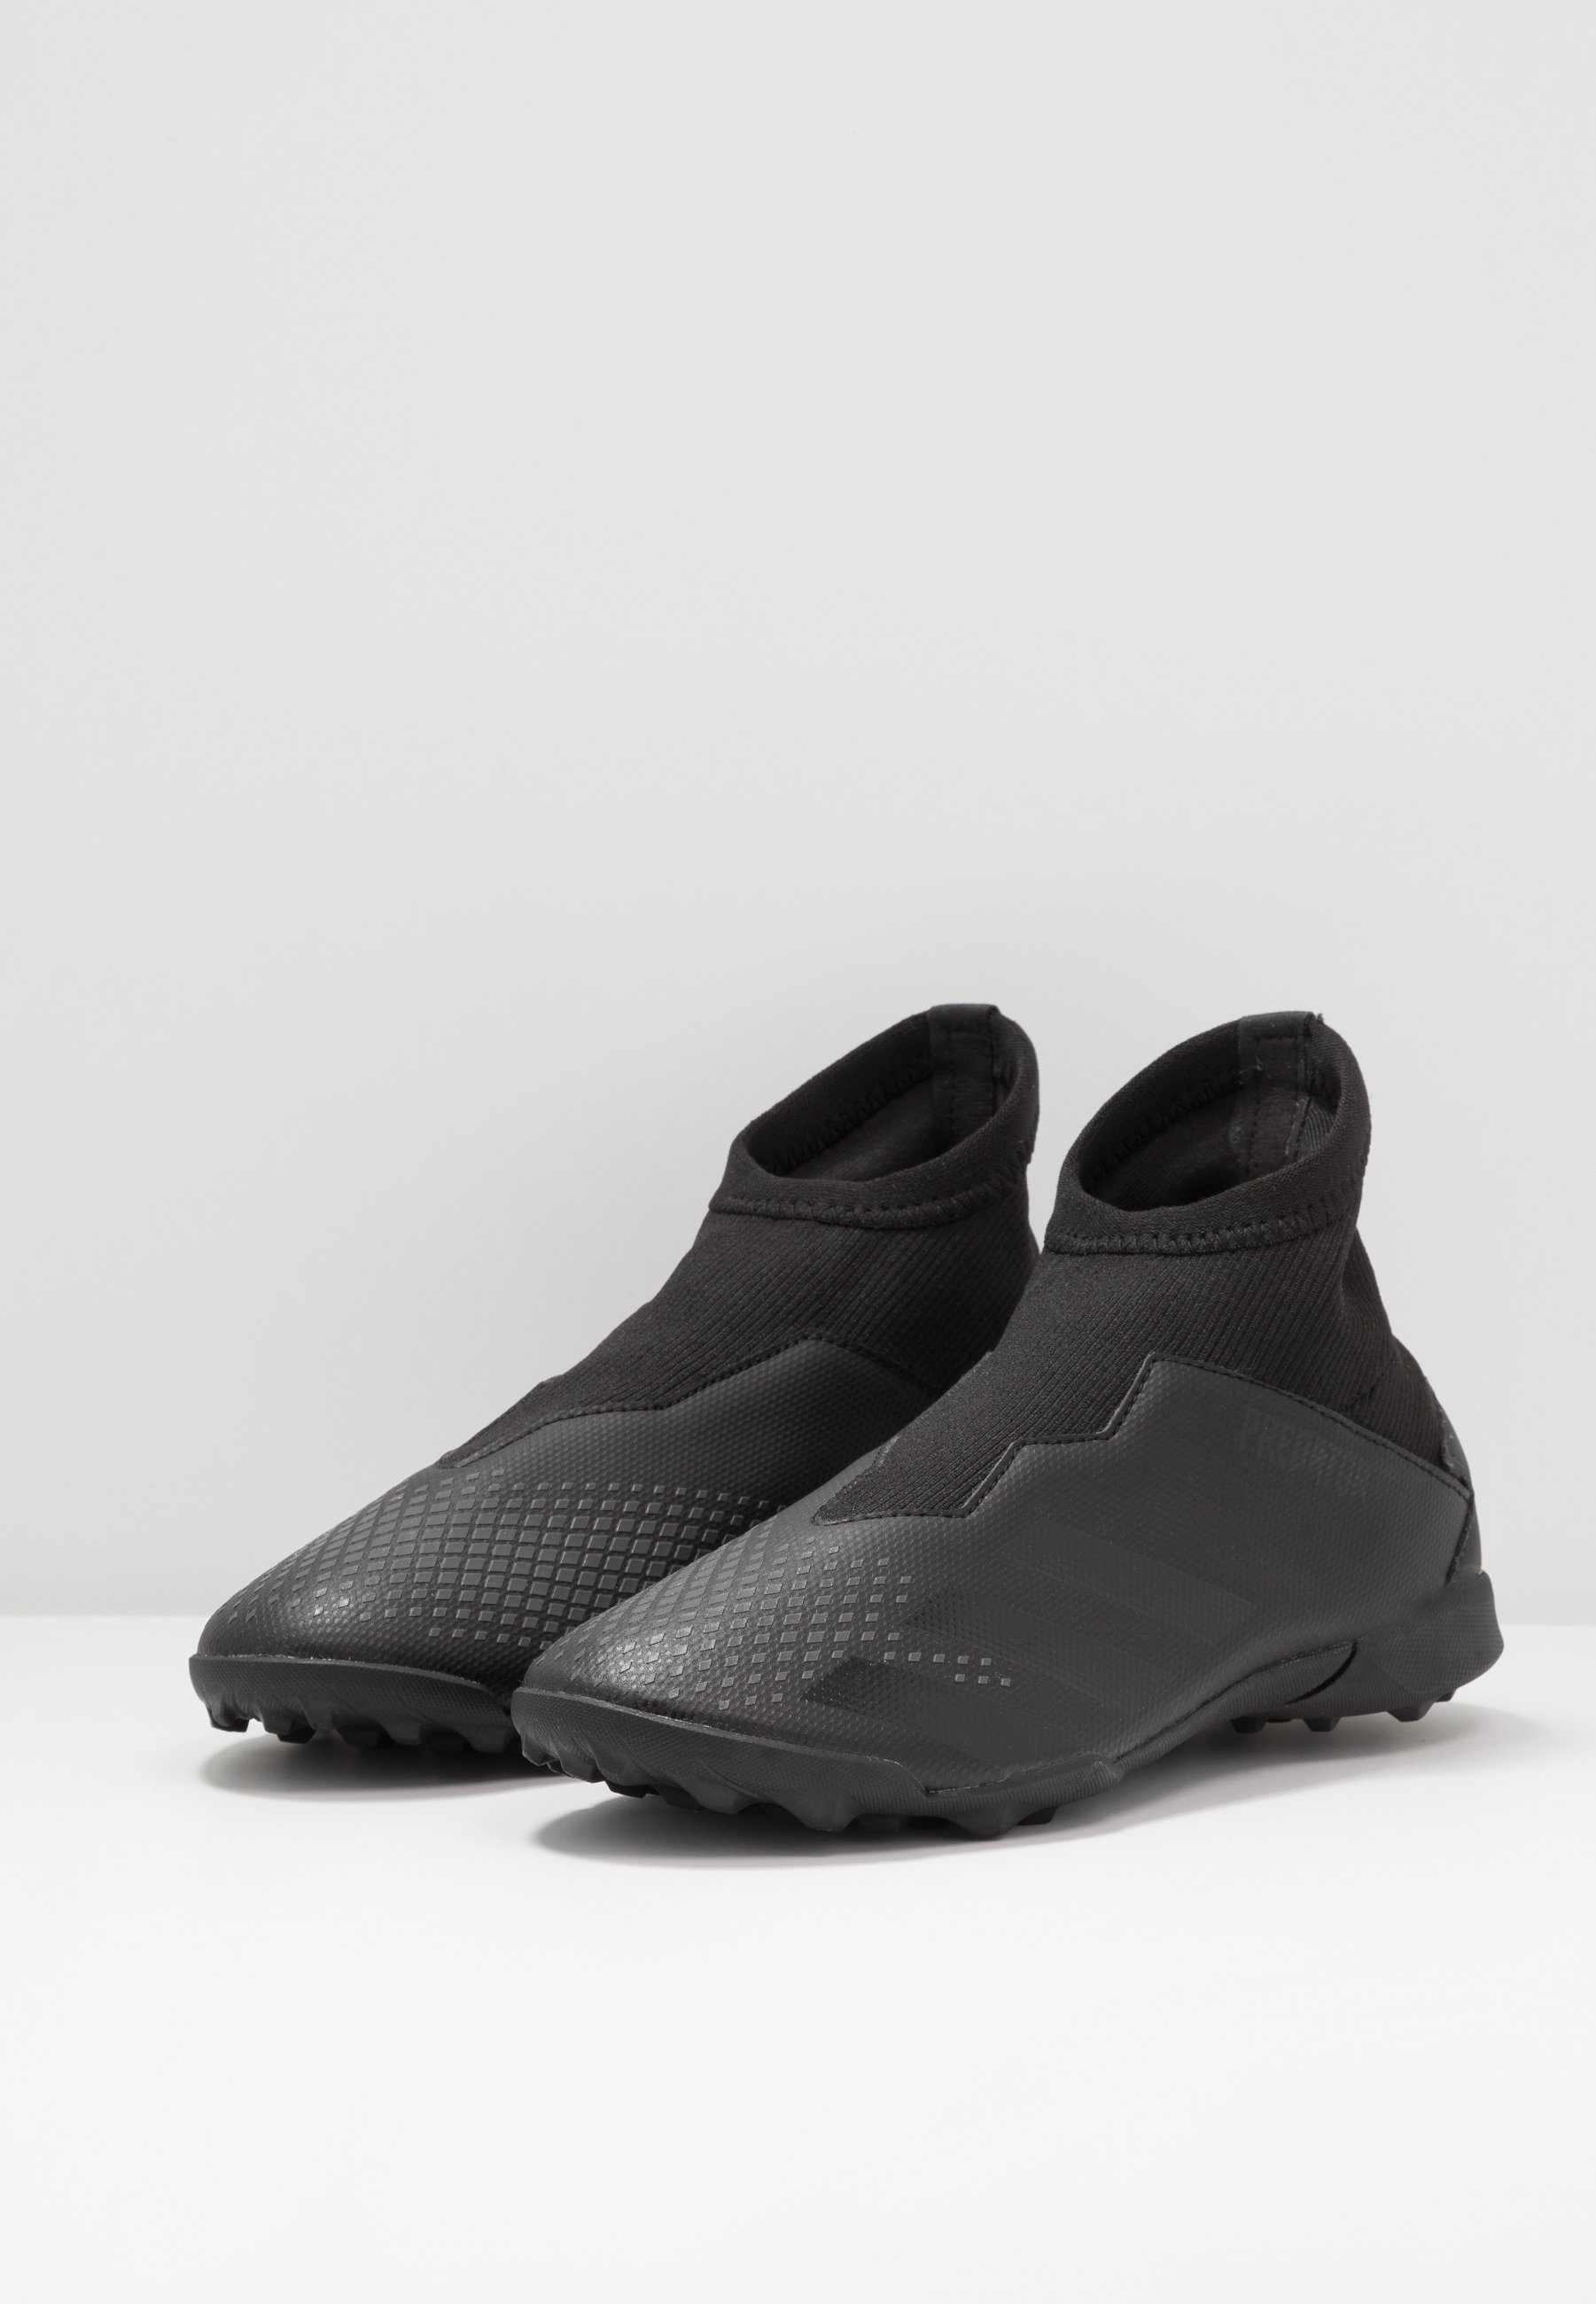 PREDATOR 20.3 LL TF Fotbollsskor universaldobbar core blackdough solid grey